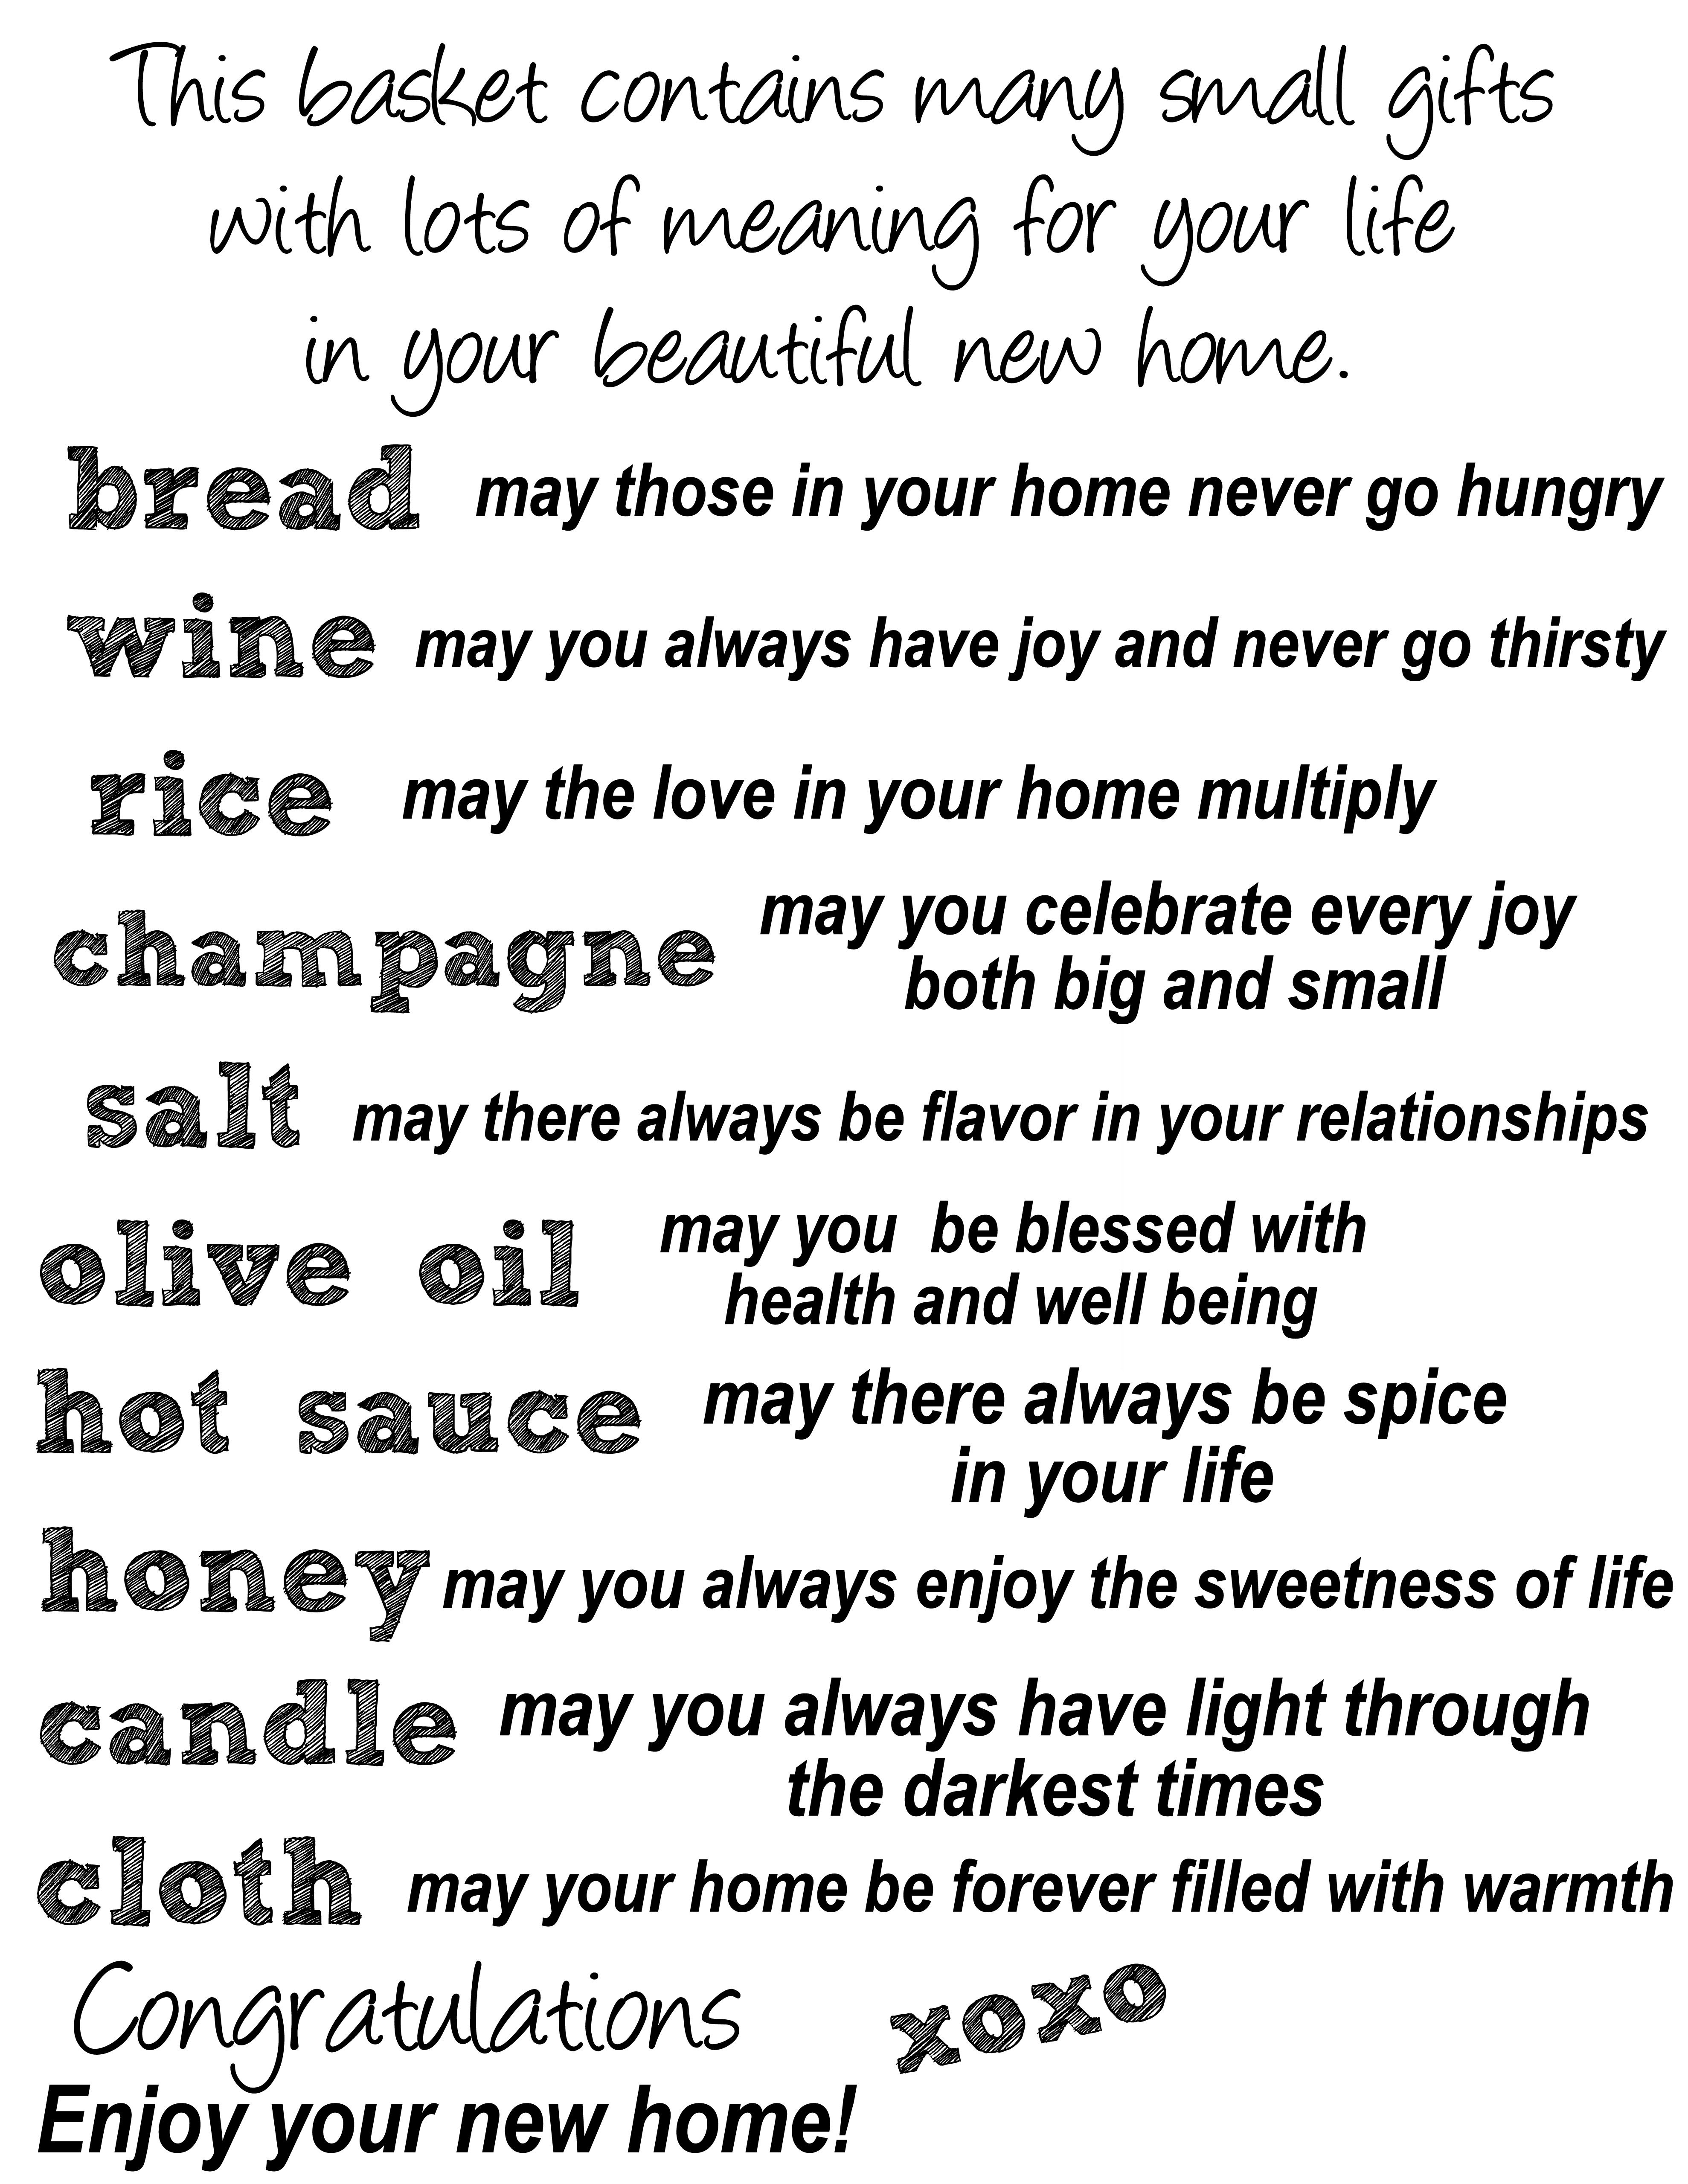 DIY Housewarming Party Gift Basket With a Sentimental Twist | Debbie ...